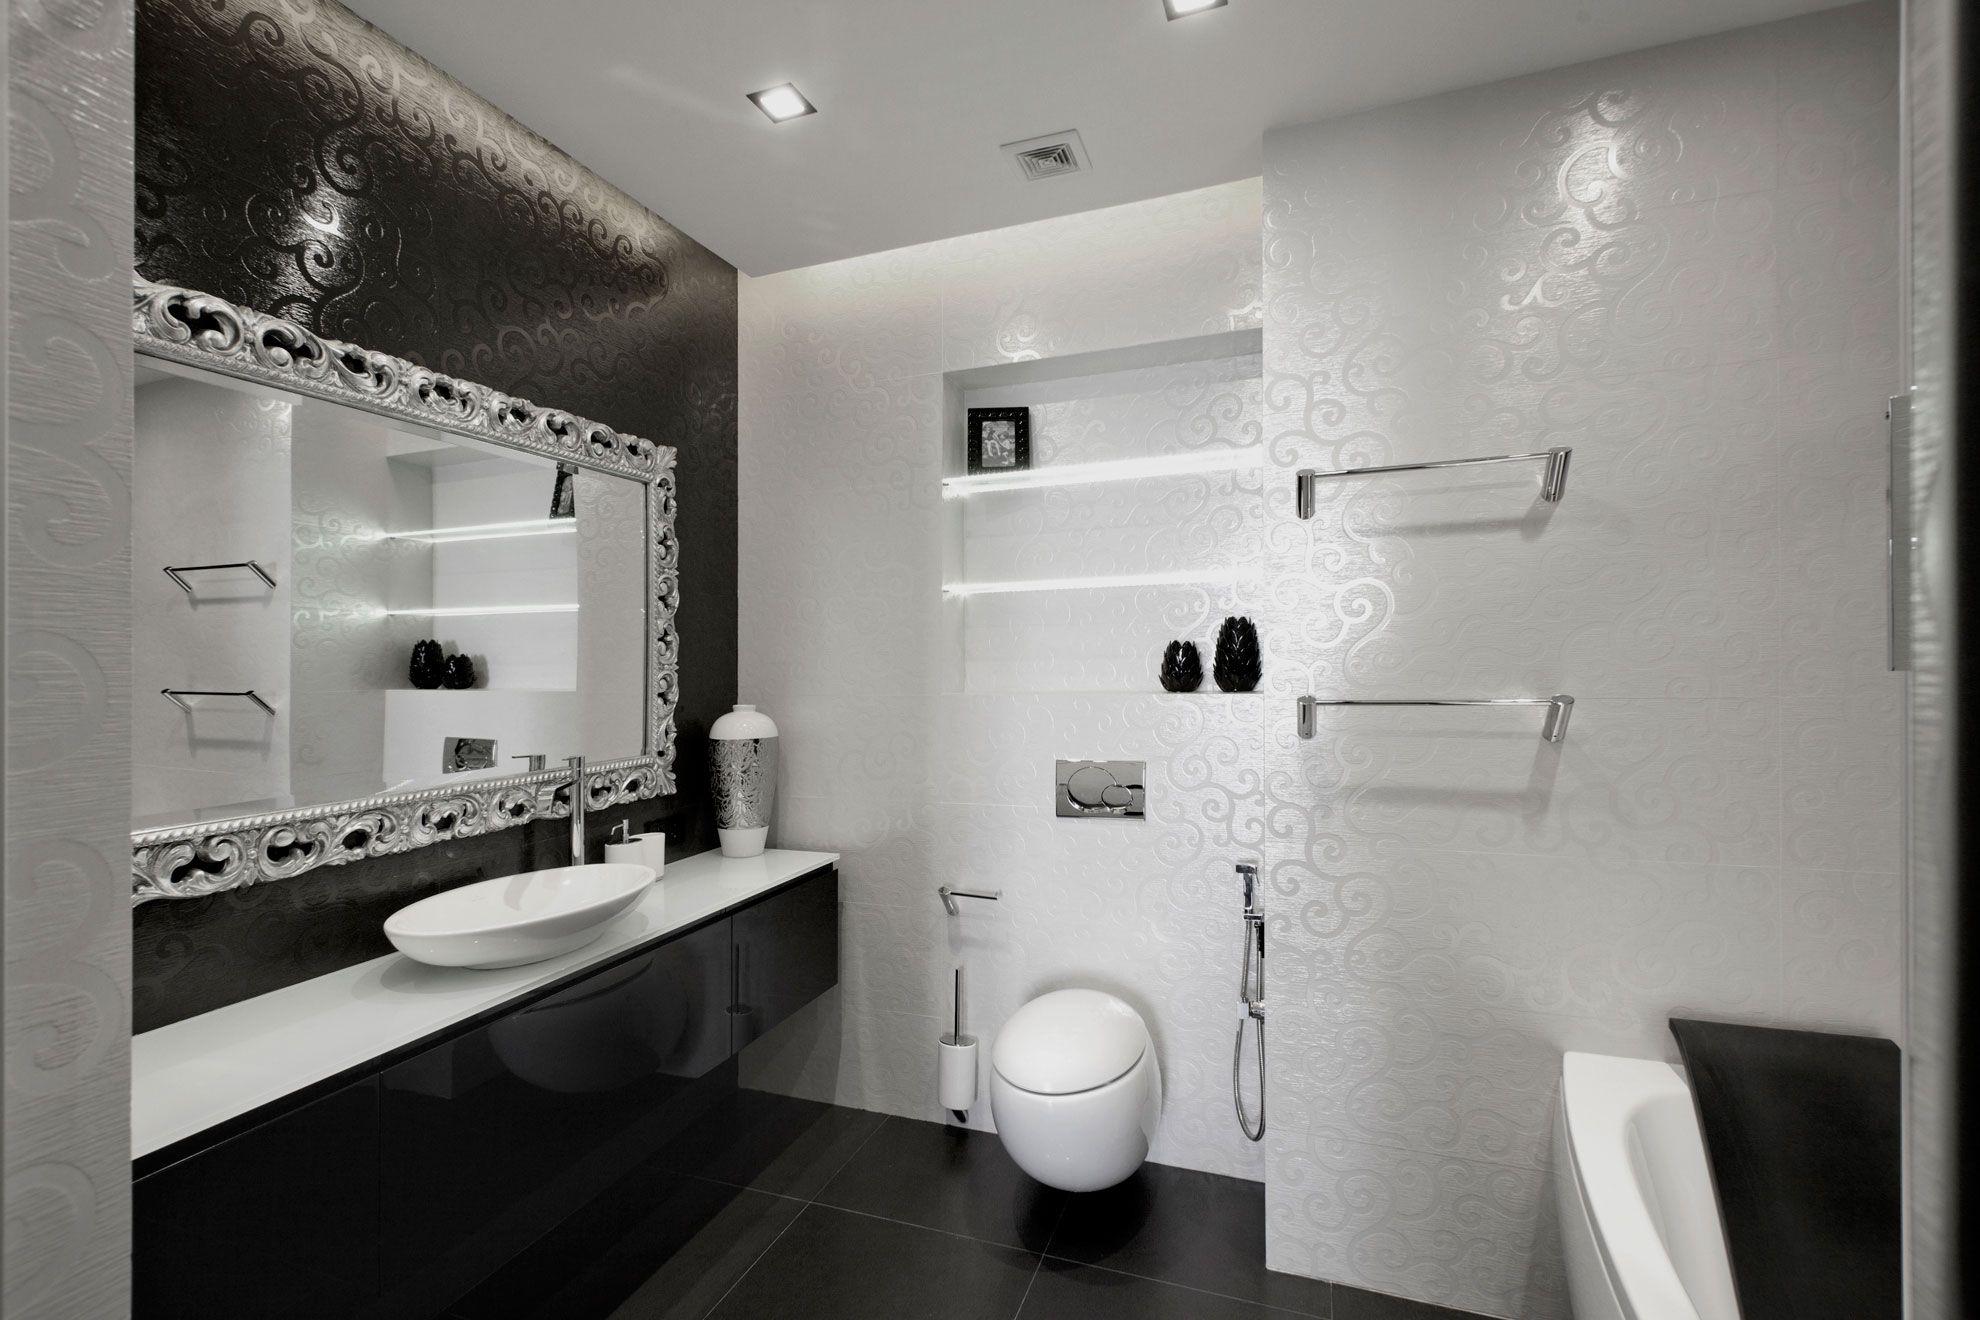 Black And White Bathroom Design Ideas Interior Stylish Black And White Interior Design For Black And White Bathroom Floor White Bathroom Decor Bathroom Design